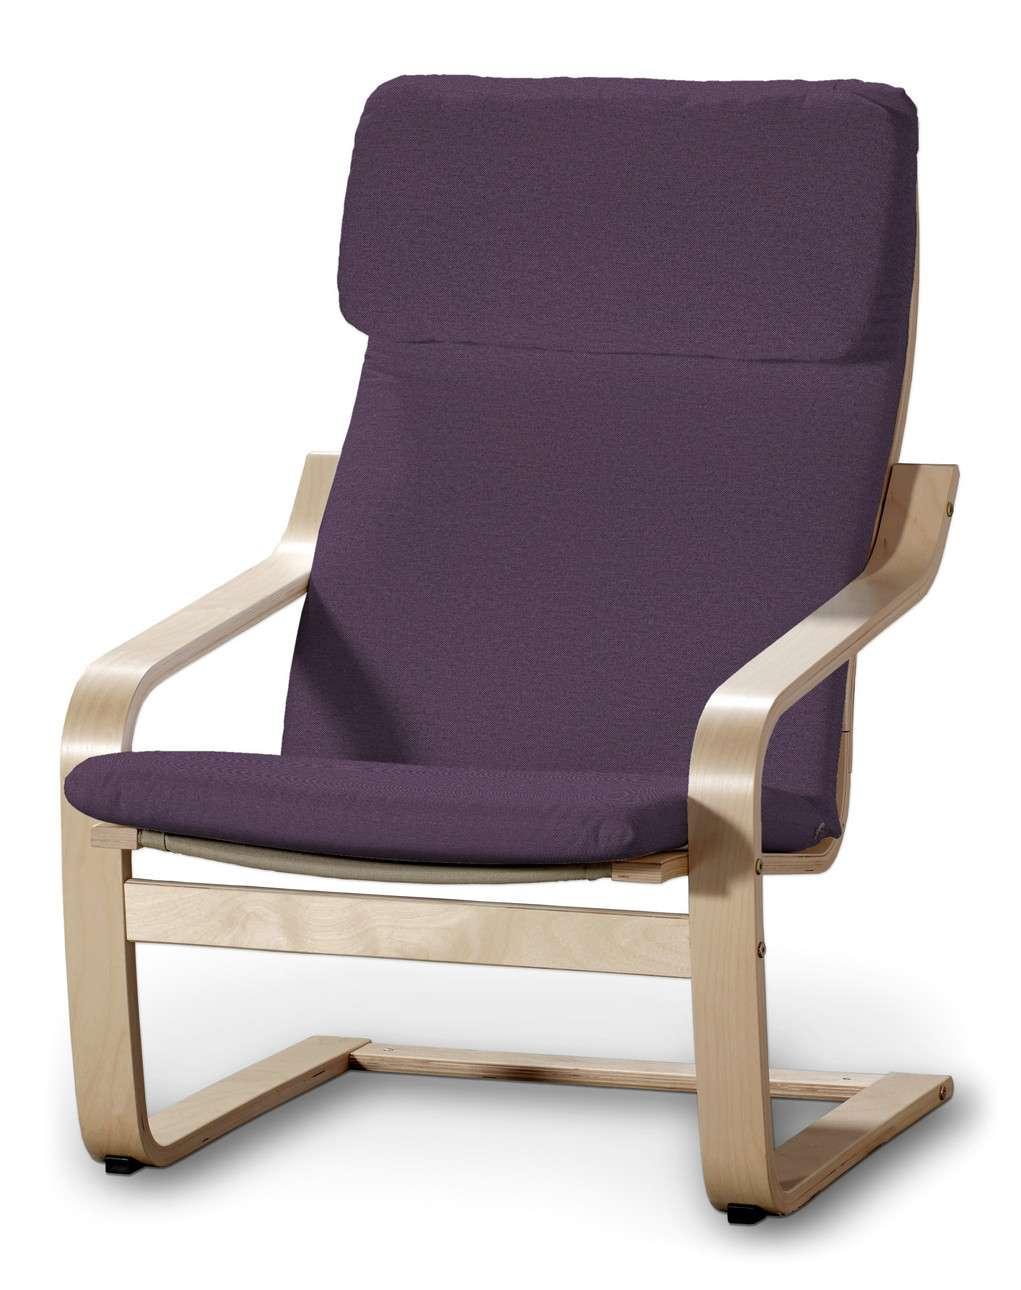 Poduszka na fotel Poäng w kolekcji Etna, tkanina: 161-27